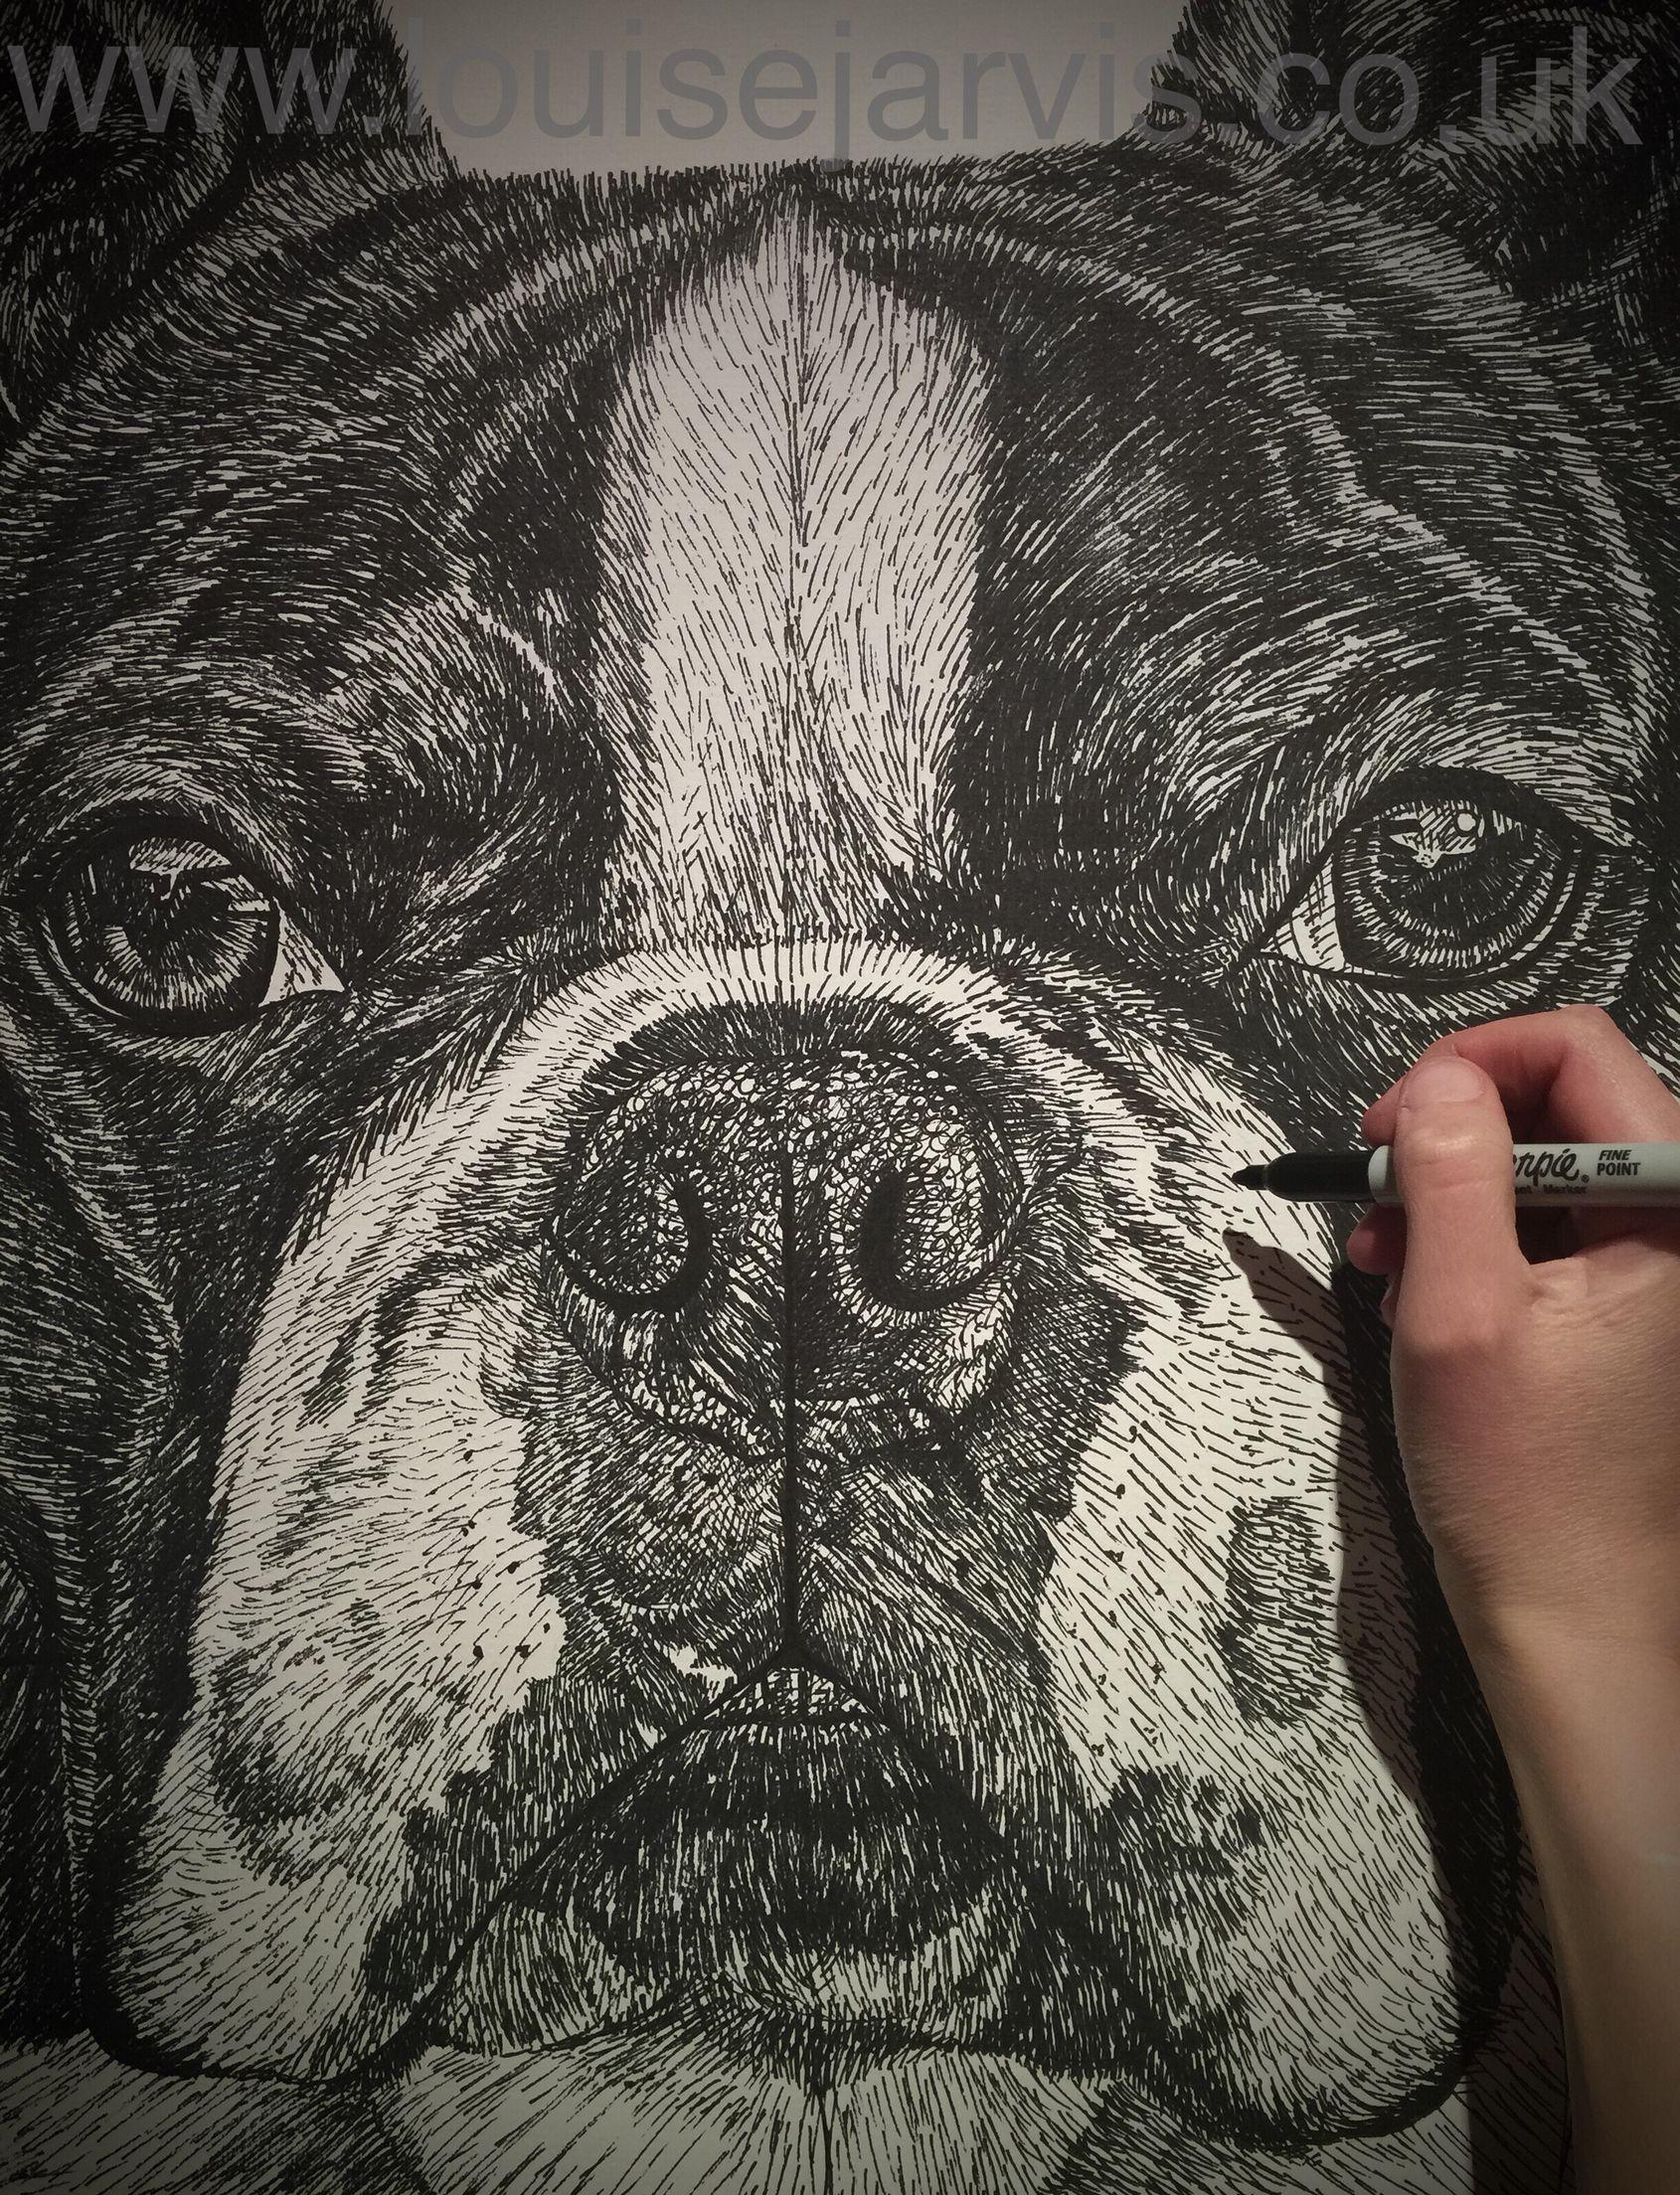 "Wilharman da Vinci (Vinci) artwork in progress :) Boston terrier 20""x20"" pen and watercolour (still to colour) follow progress at Facebook.com/LouiseJarvisArt  https://www.facebook.com/LouiseJarvisArt/posts/1109839555747459 #bostonterrier #dogs canineart"